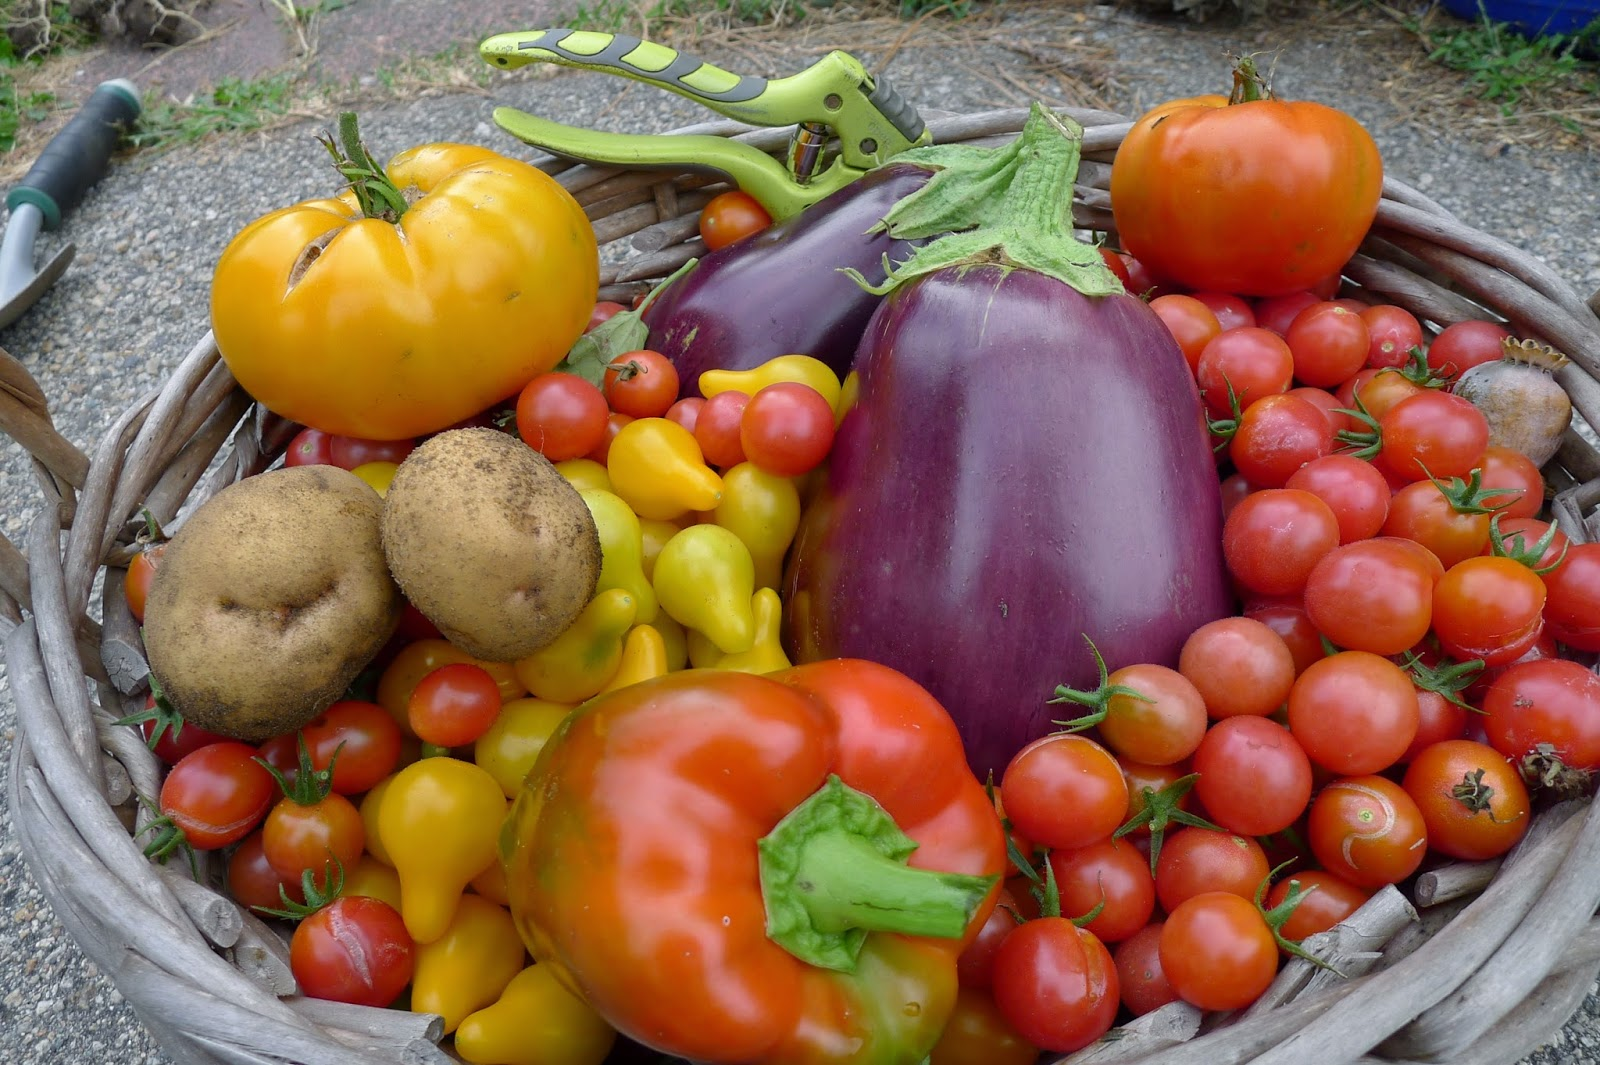 Home grown food, urban farming, gardening